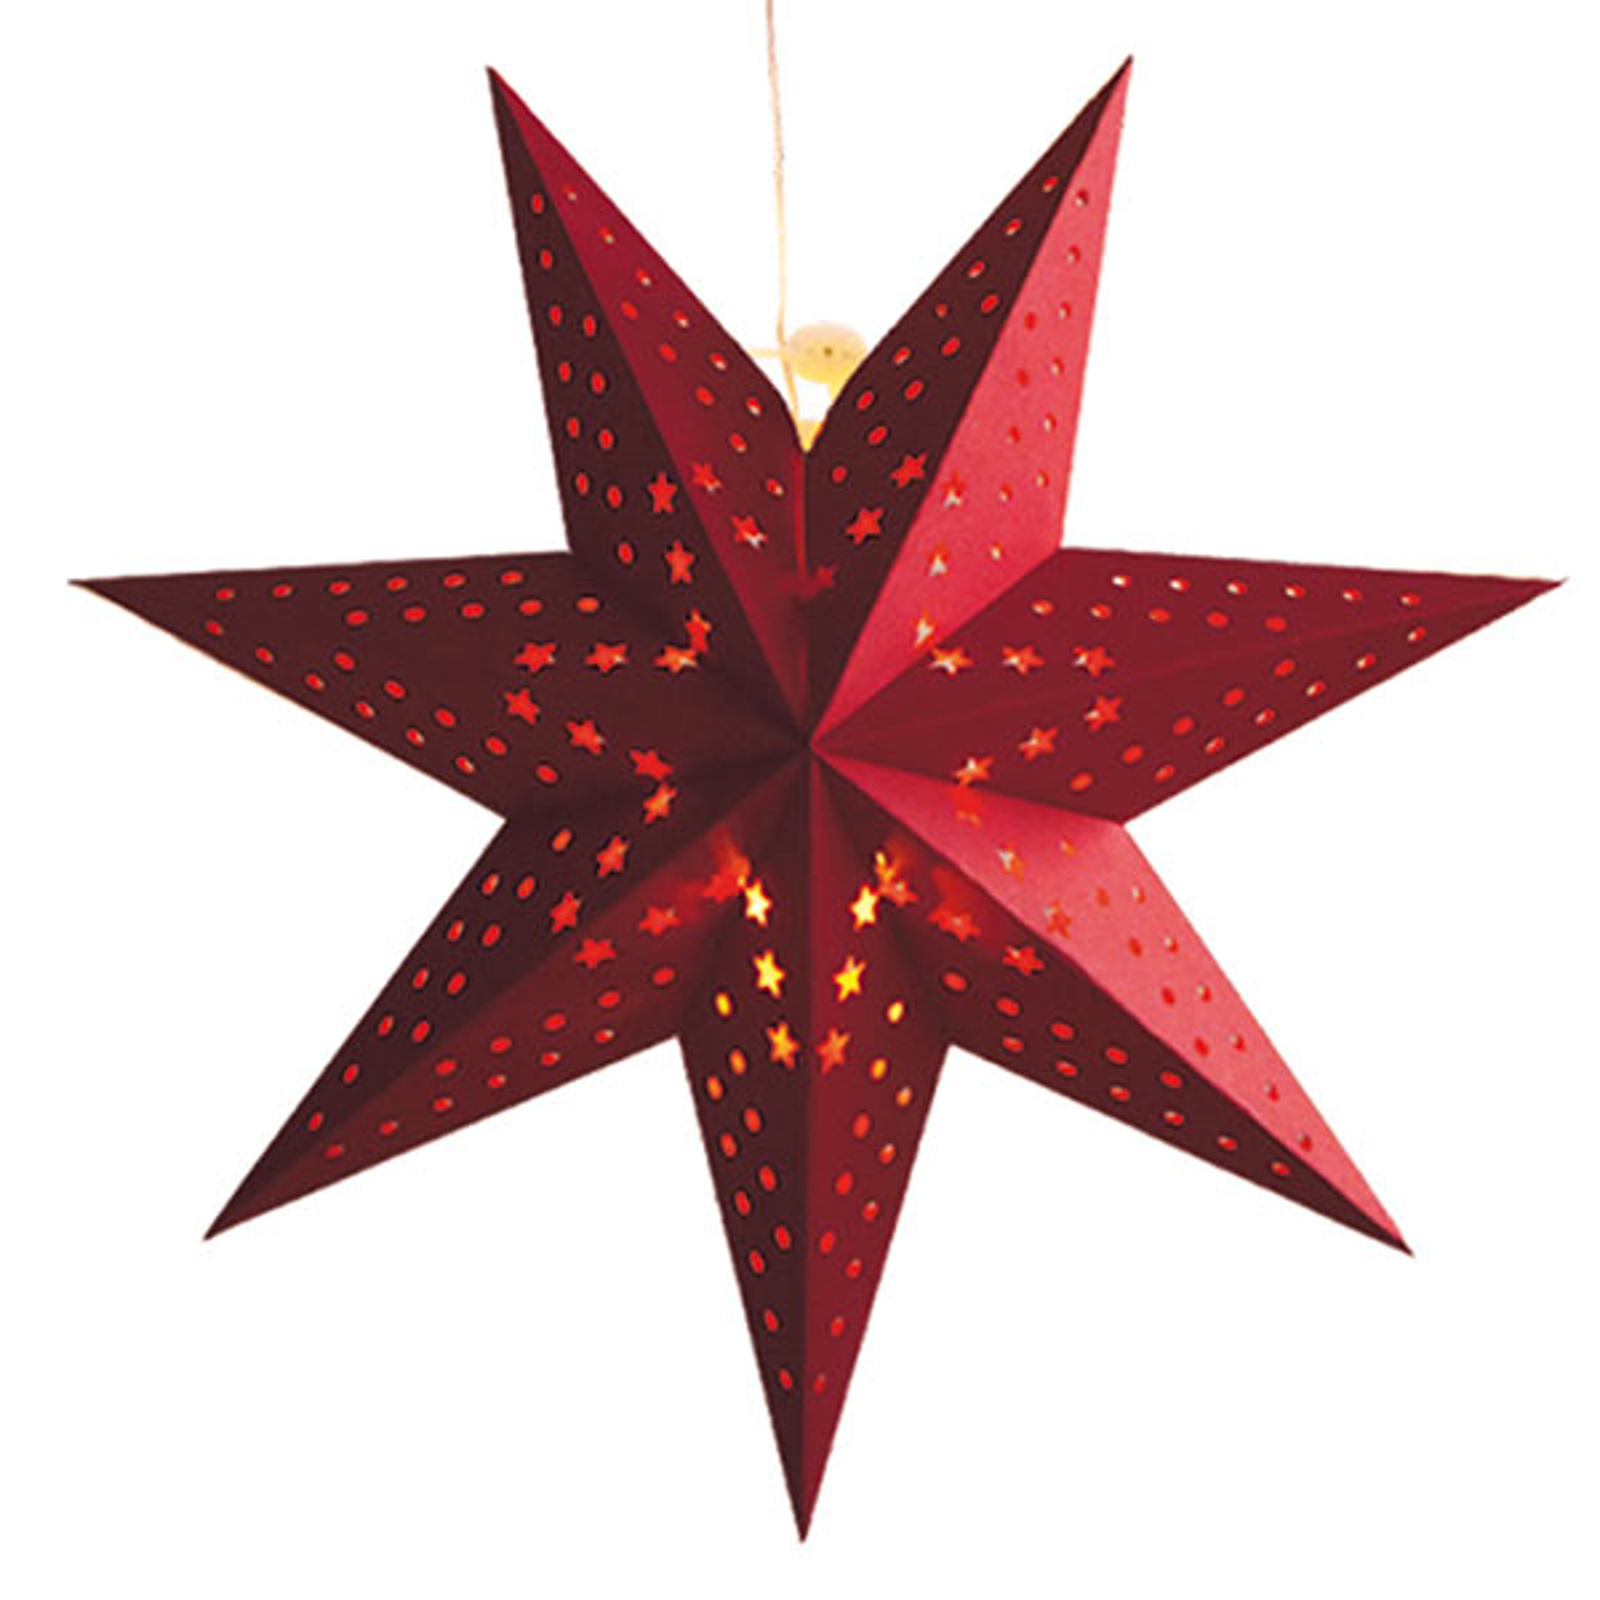 Hullmønster snøfnugg - LED-stjerne Cellcandle rød